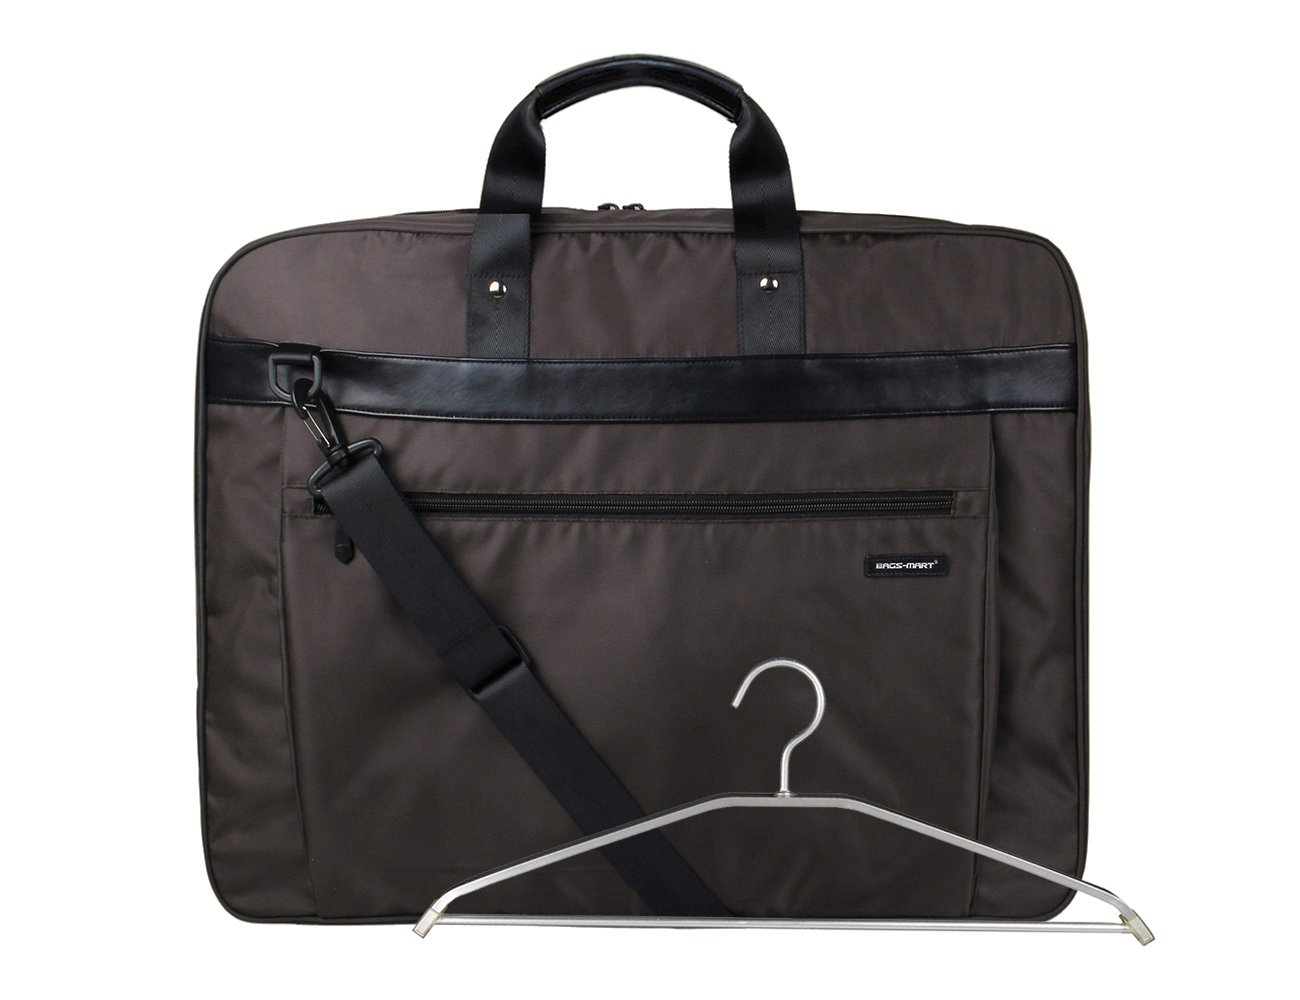 BAGSMART Travel Carryon Folded Garment Bag for Suits and Wedding Dresses with Shoulder Strap and Hanger, Brown